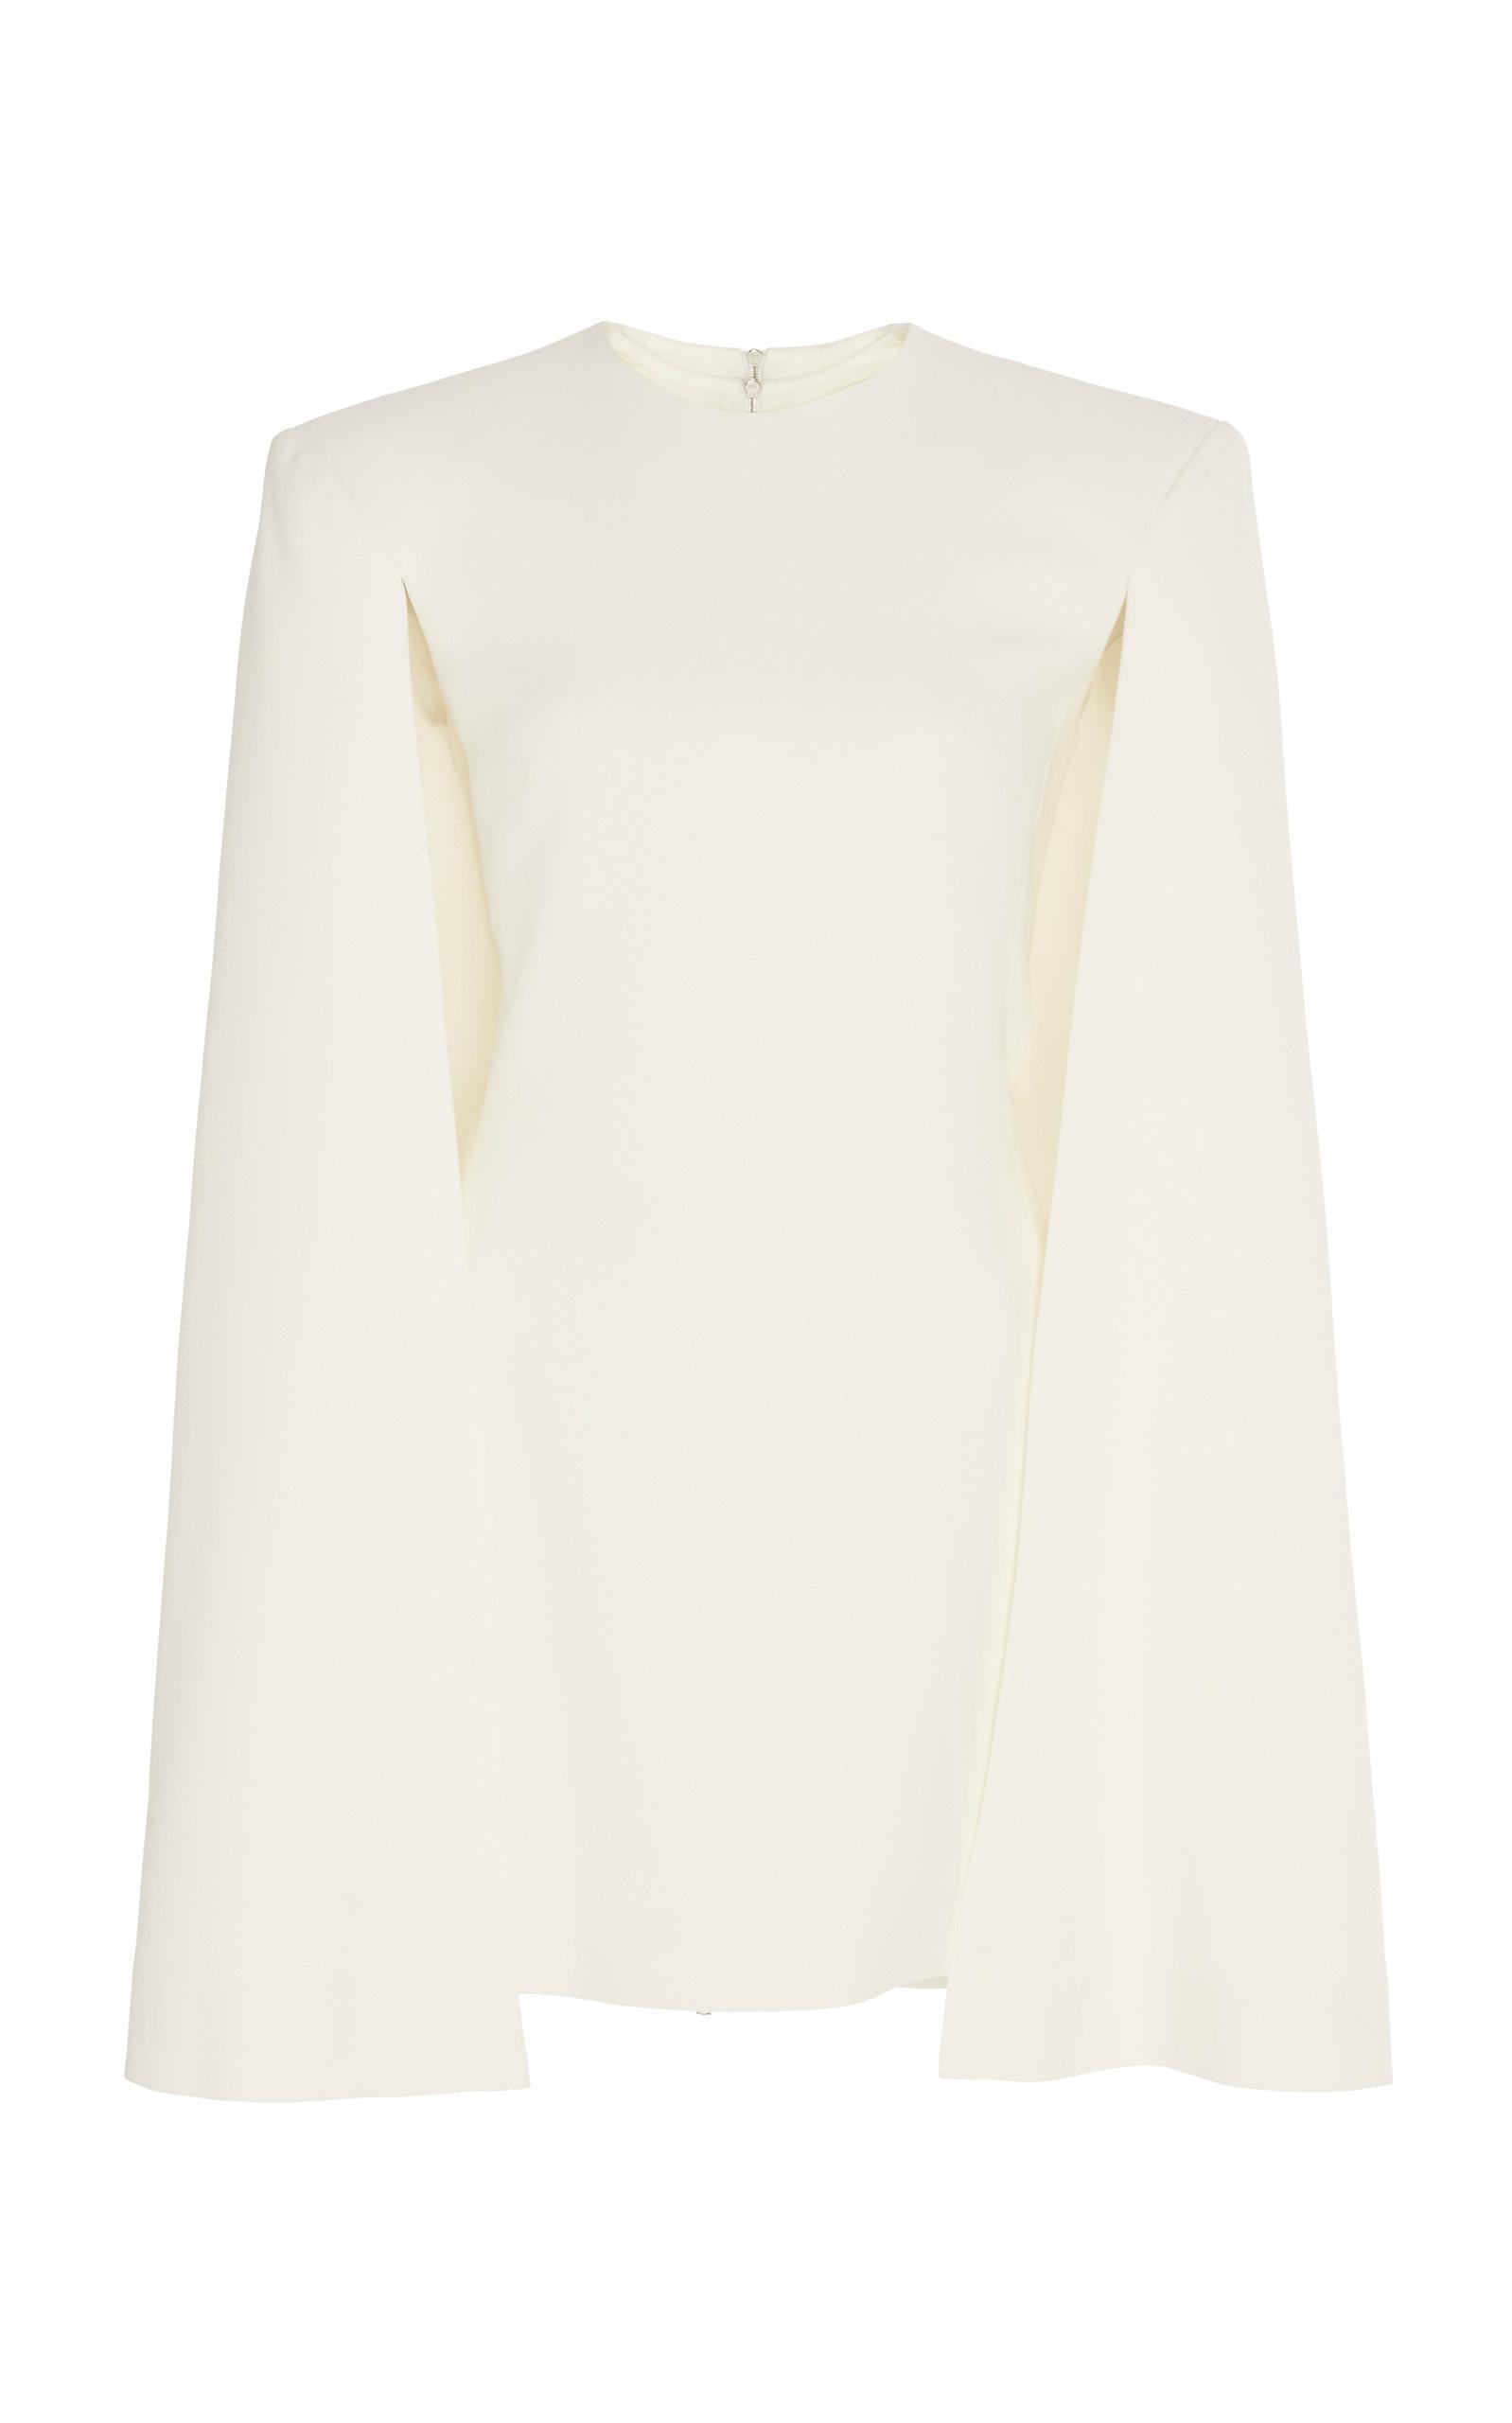 Buy David Koma Cape-Effect Crepe Dress online, shop David Koma at the best price